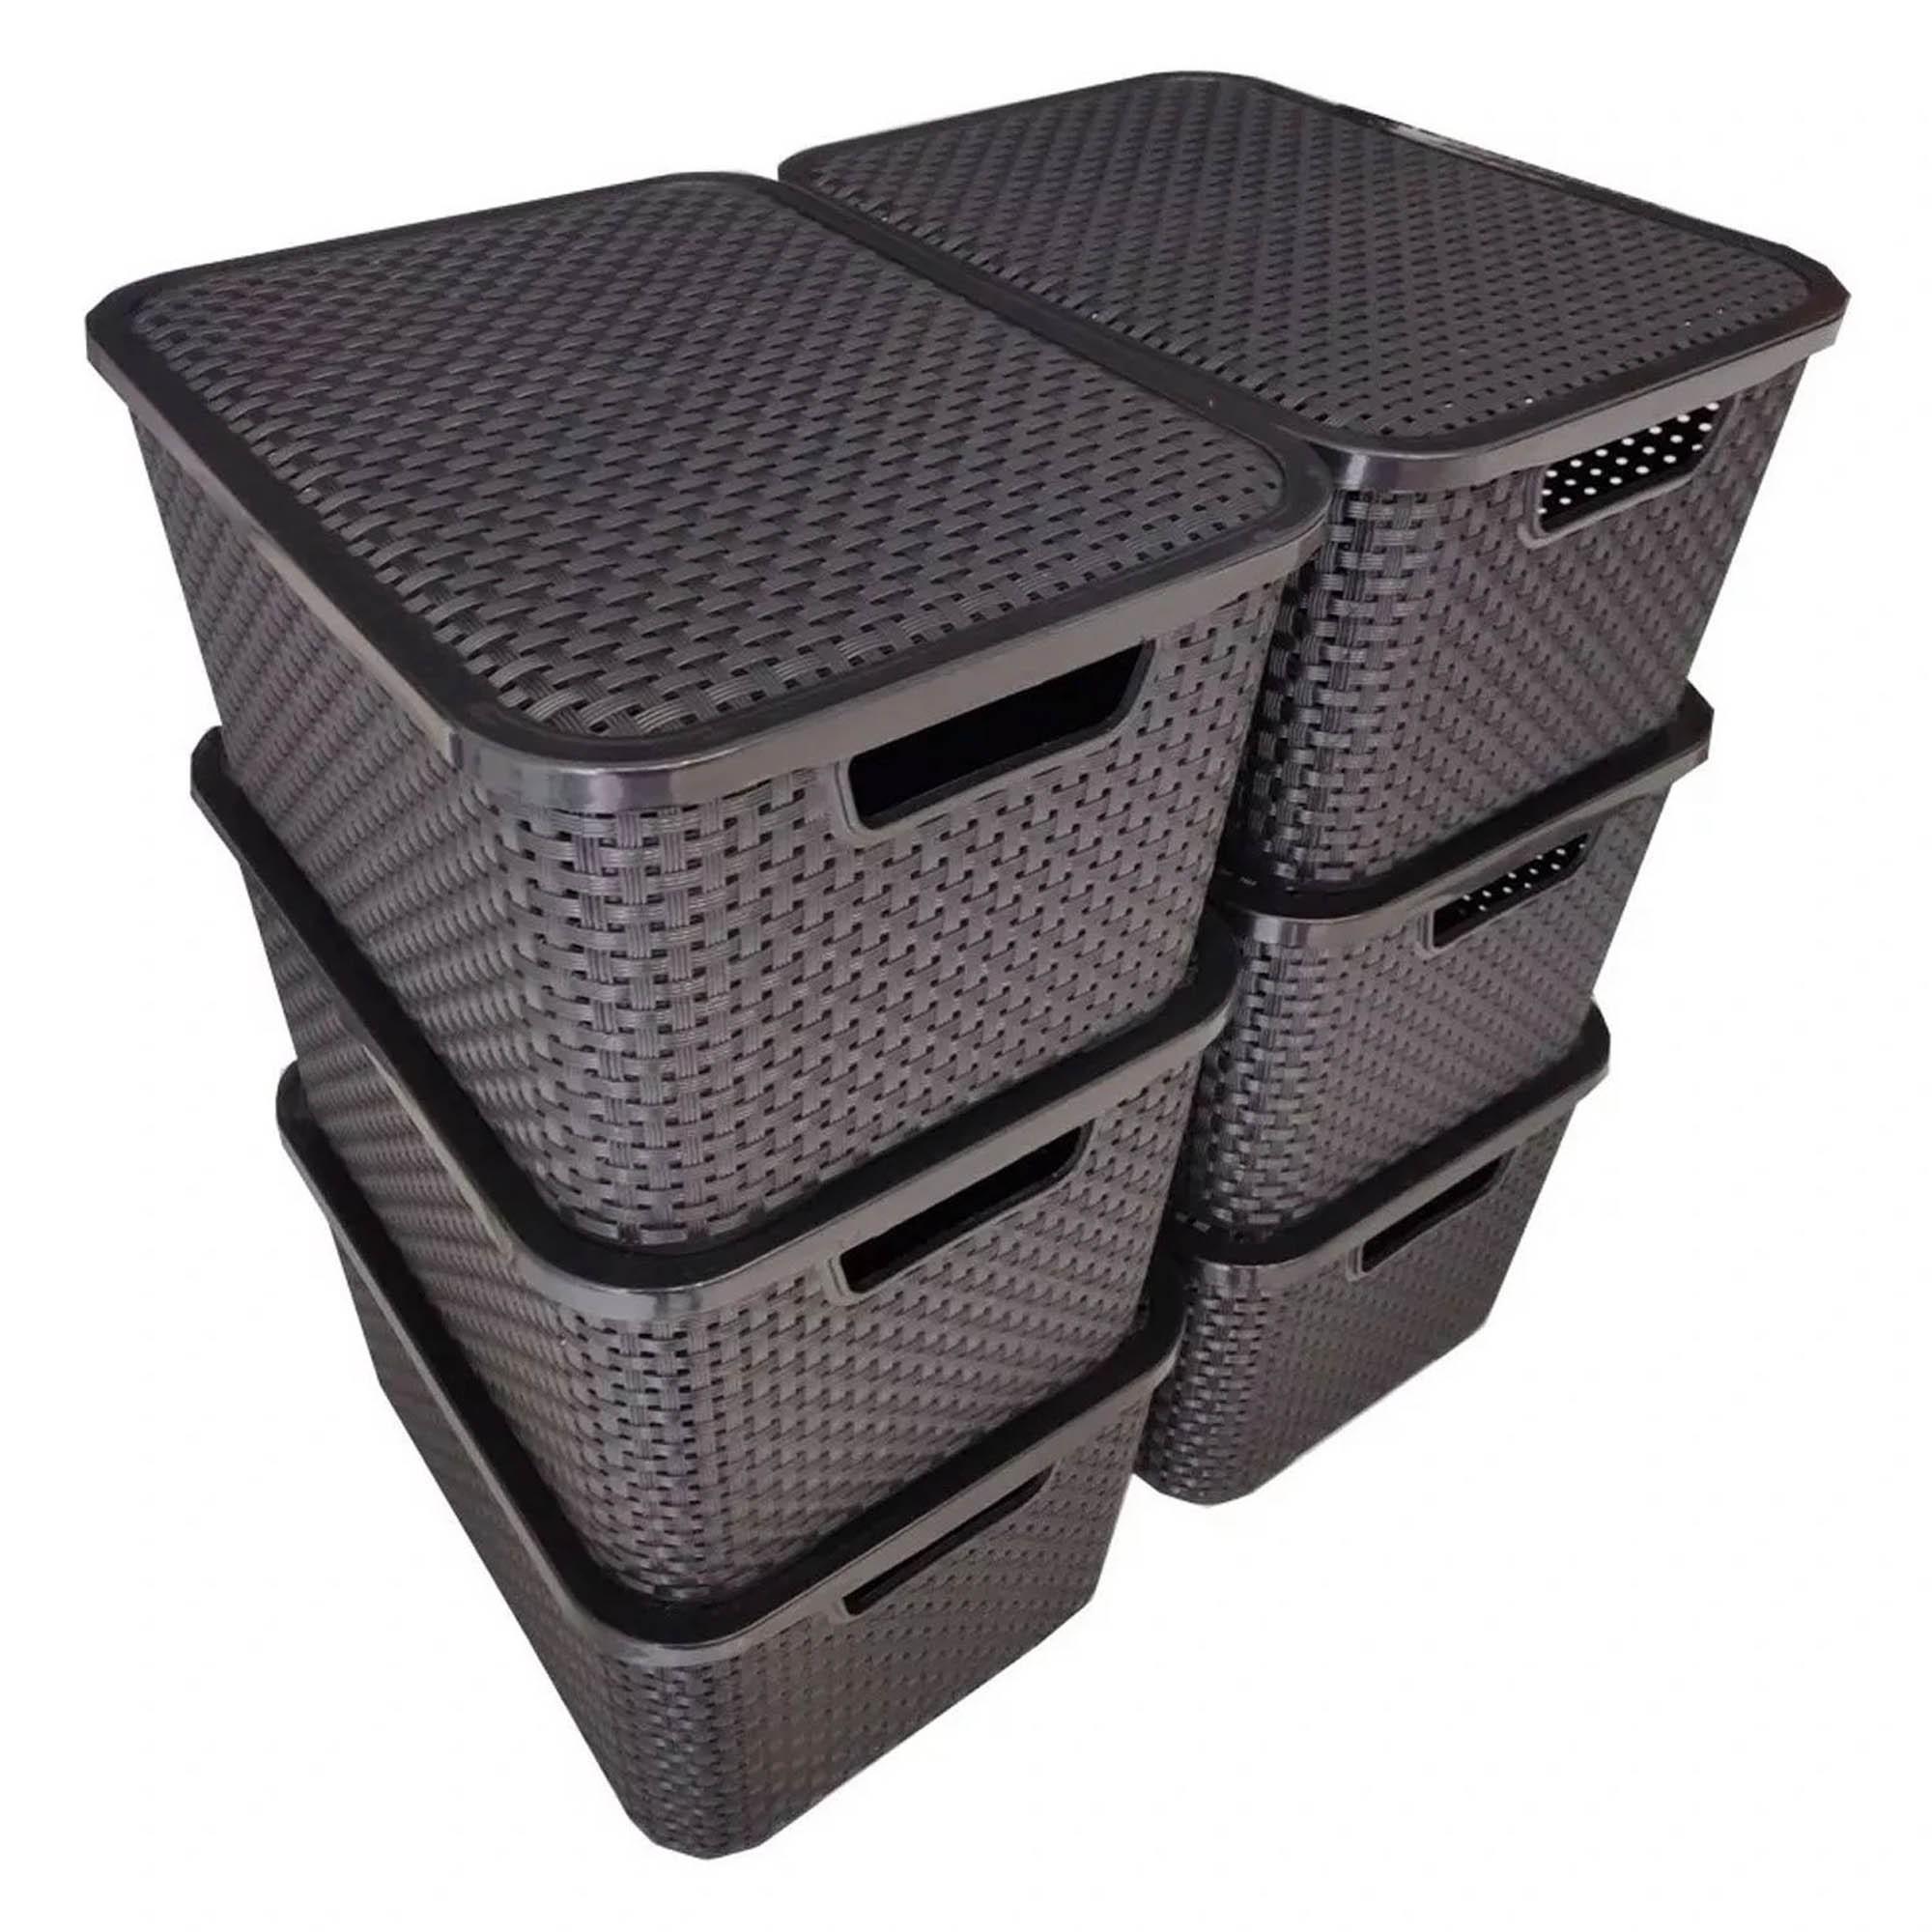 6 x Caixa Organizadora Plástica Cesto Rattan 15 L Com Tampa